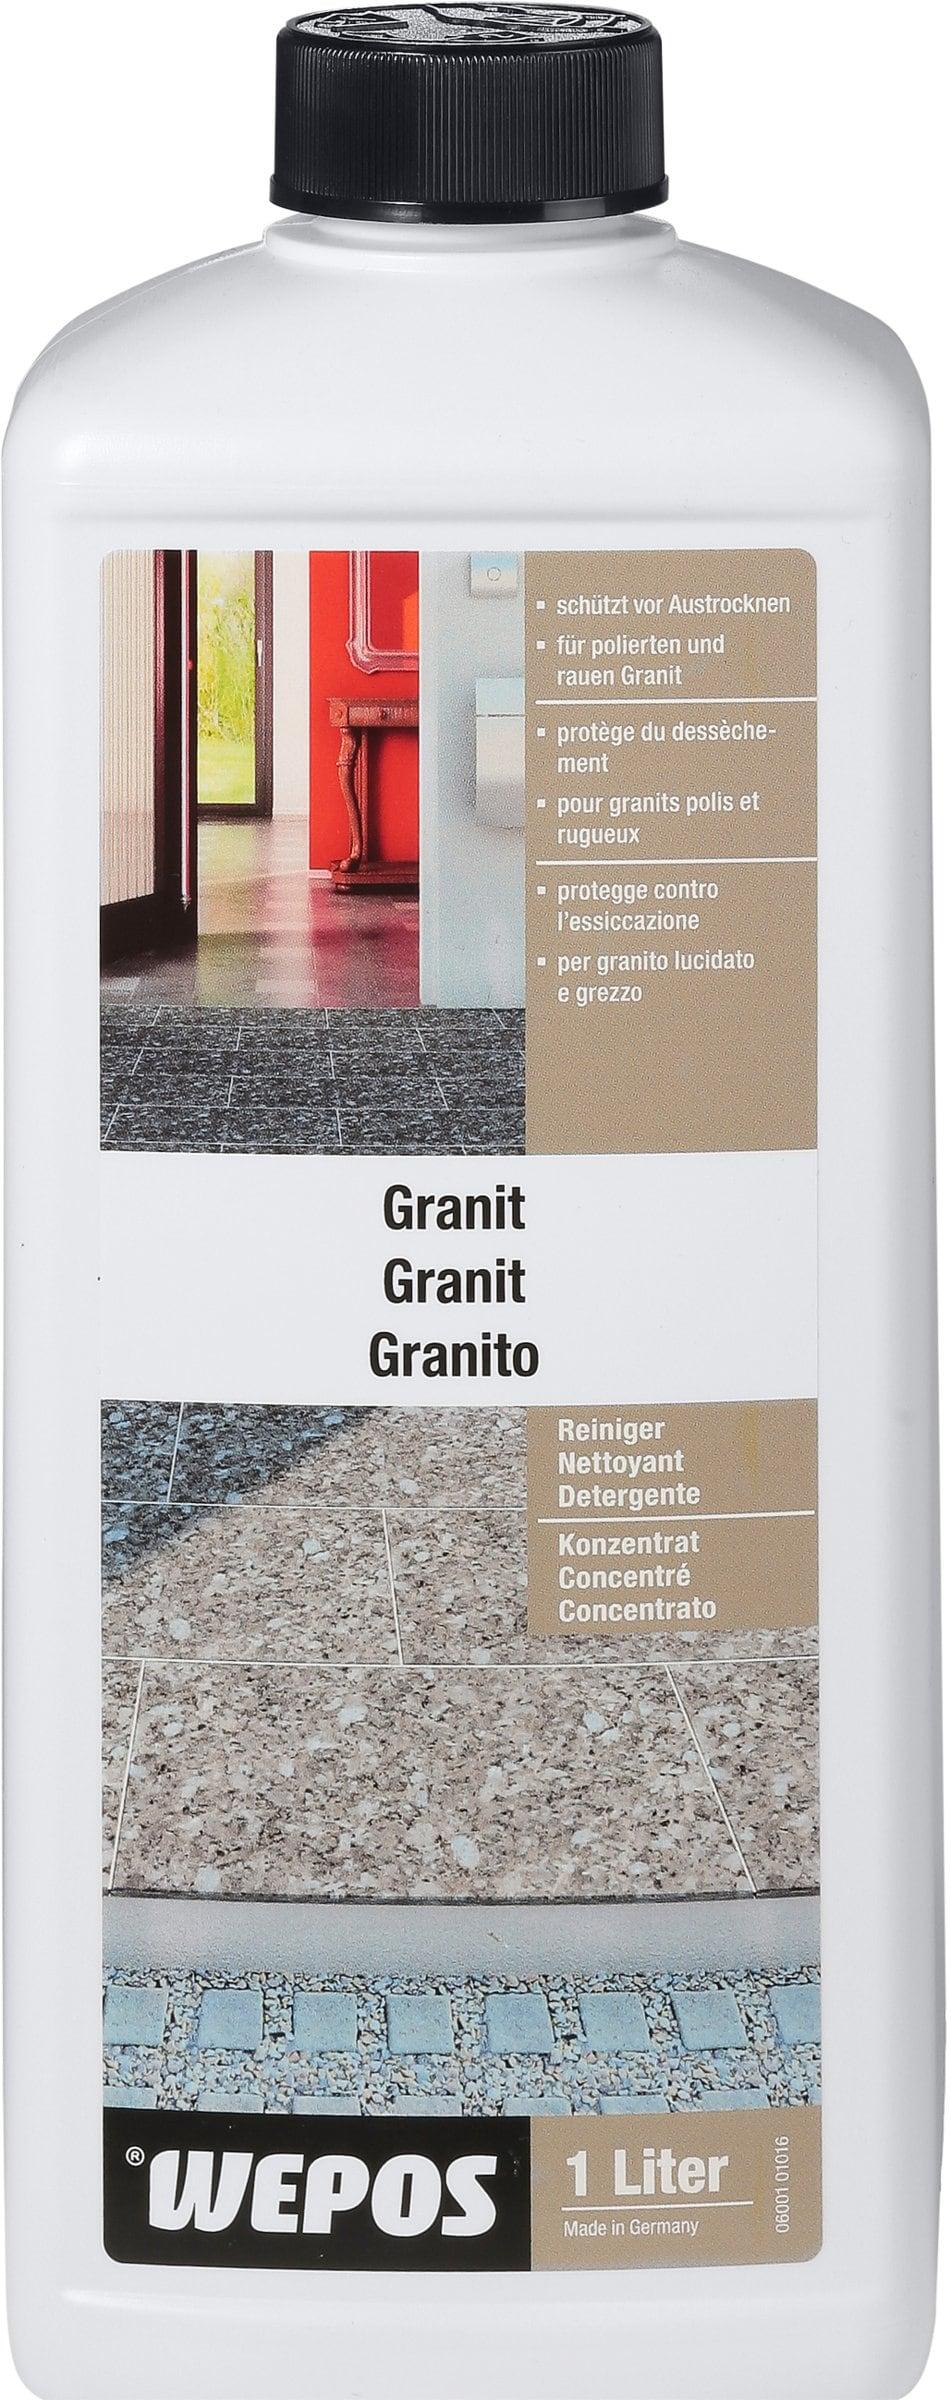 wepos granit reiniger konzentrat migipedia. Black Bedroom Furniture Sets. Home Design Ideas